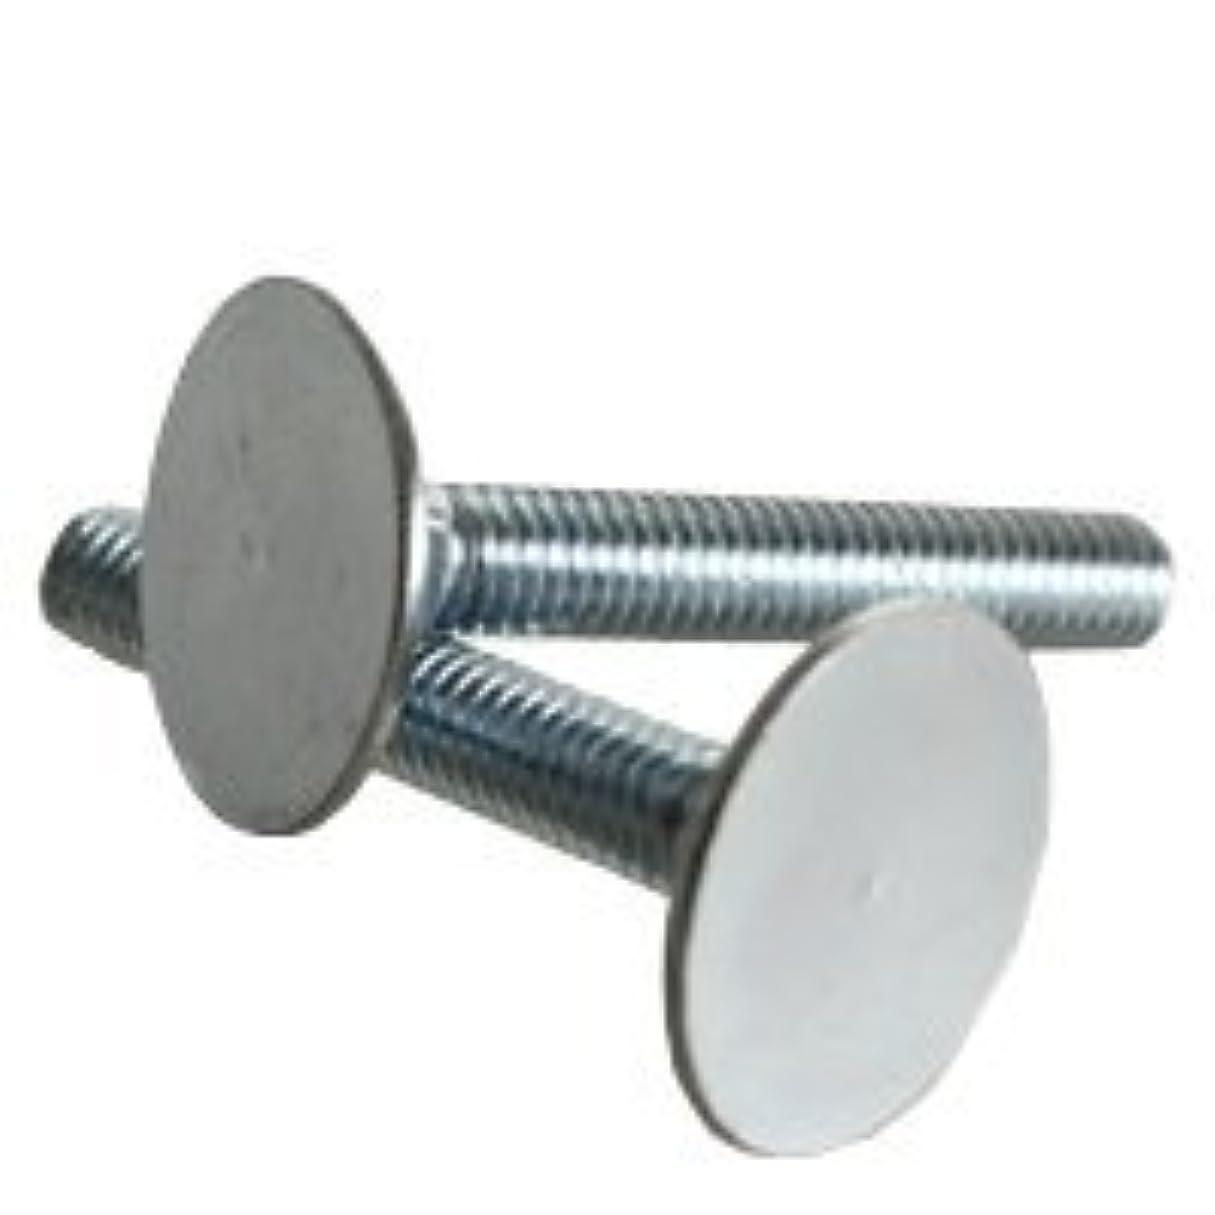 weight10.56Lbs Box of 100 Elevator Bolt Zinc 3//8-16 x 3